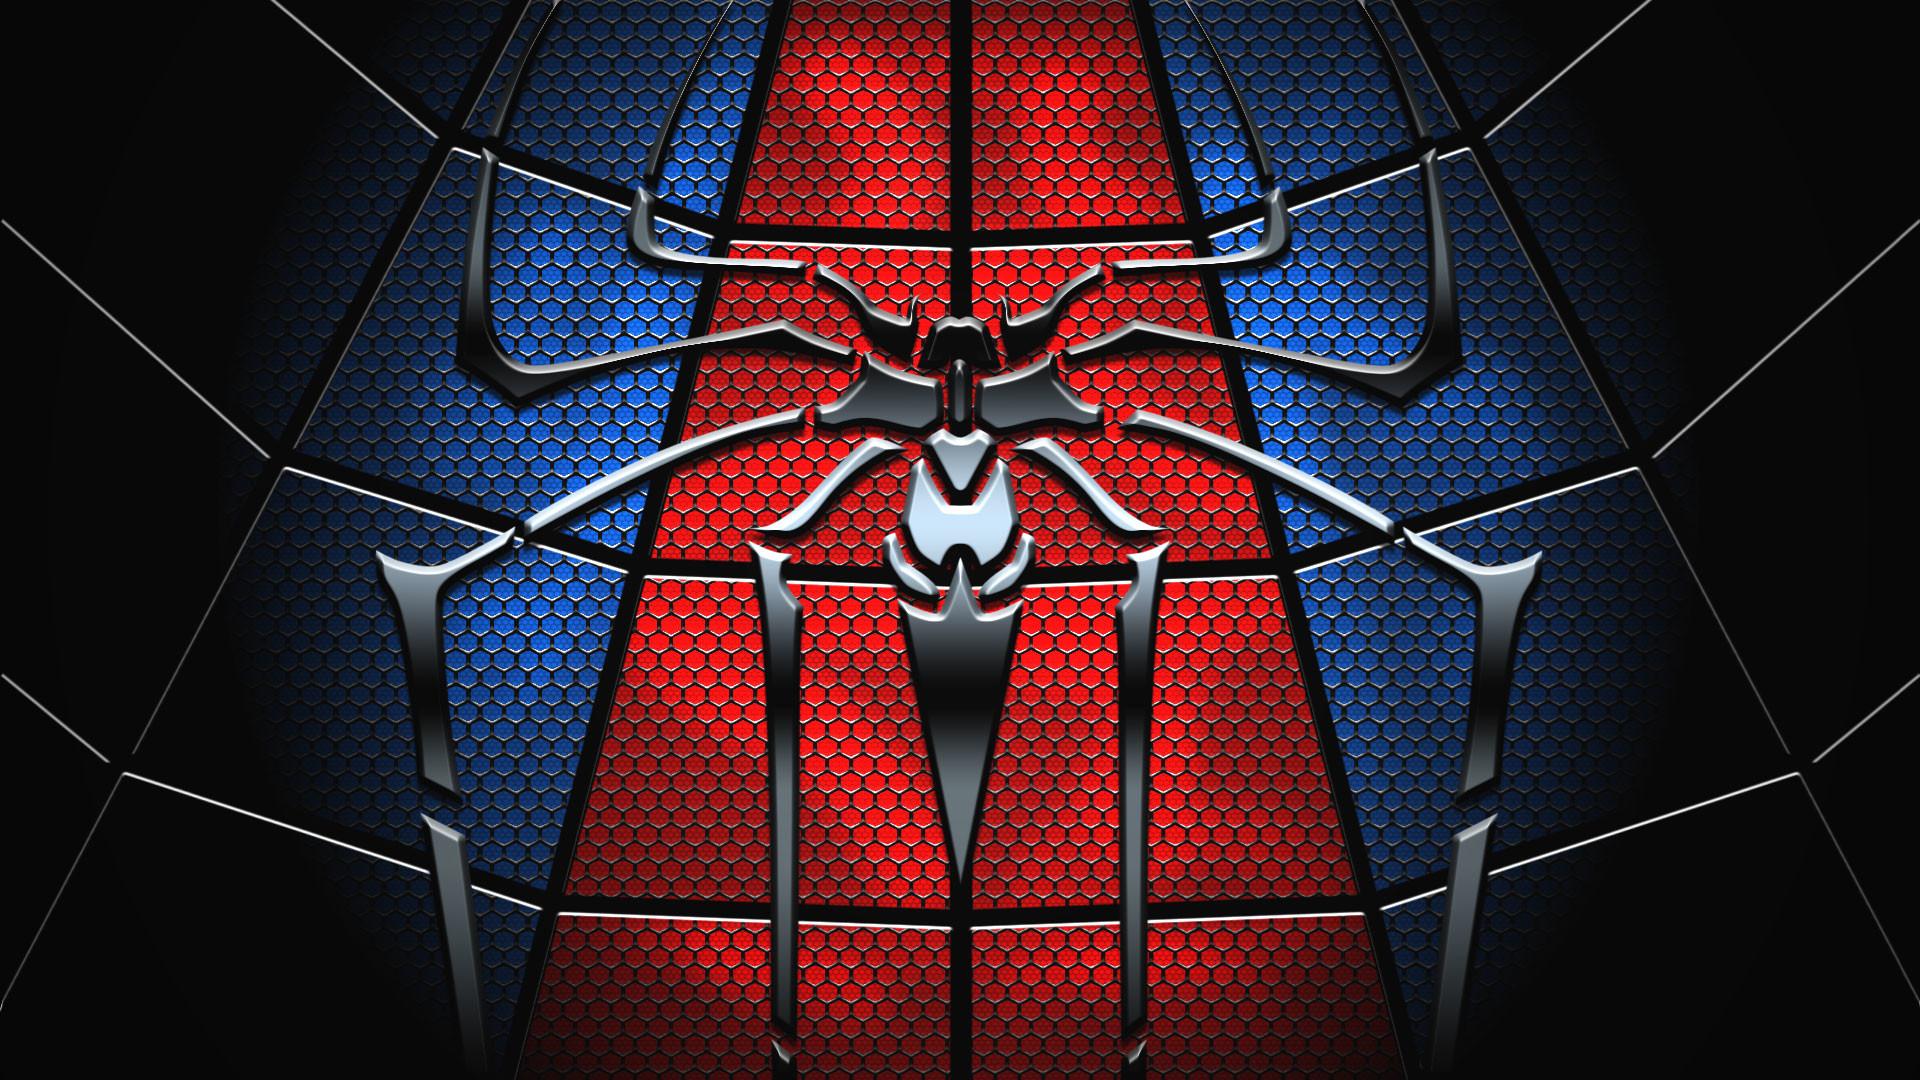 Ultimate Spider-Man (Video Game) (MDCCU) | Comic Crossroads | FANDOM  powered by Wikia